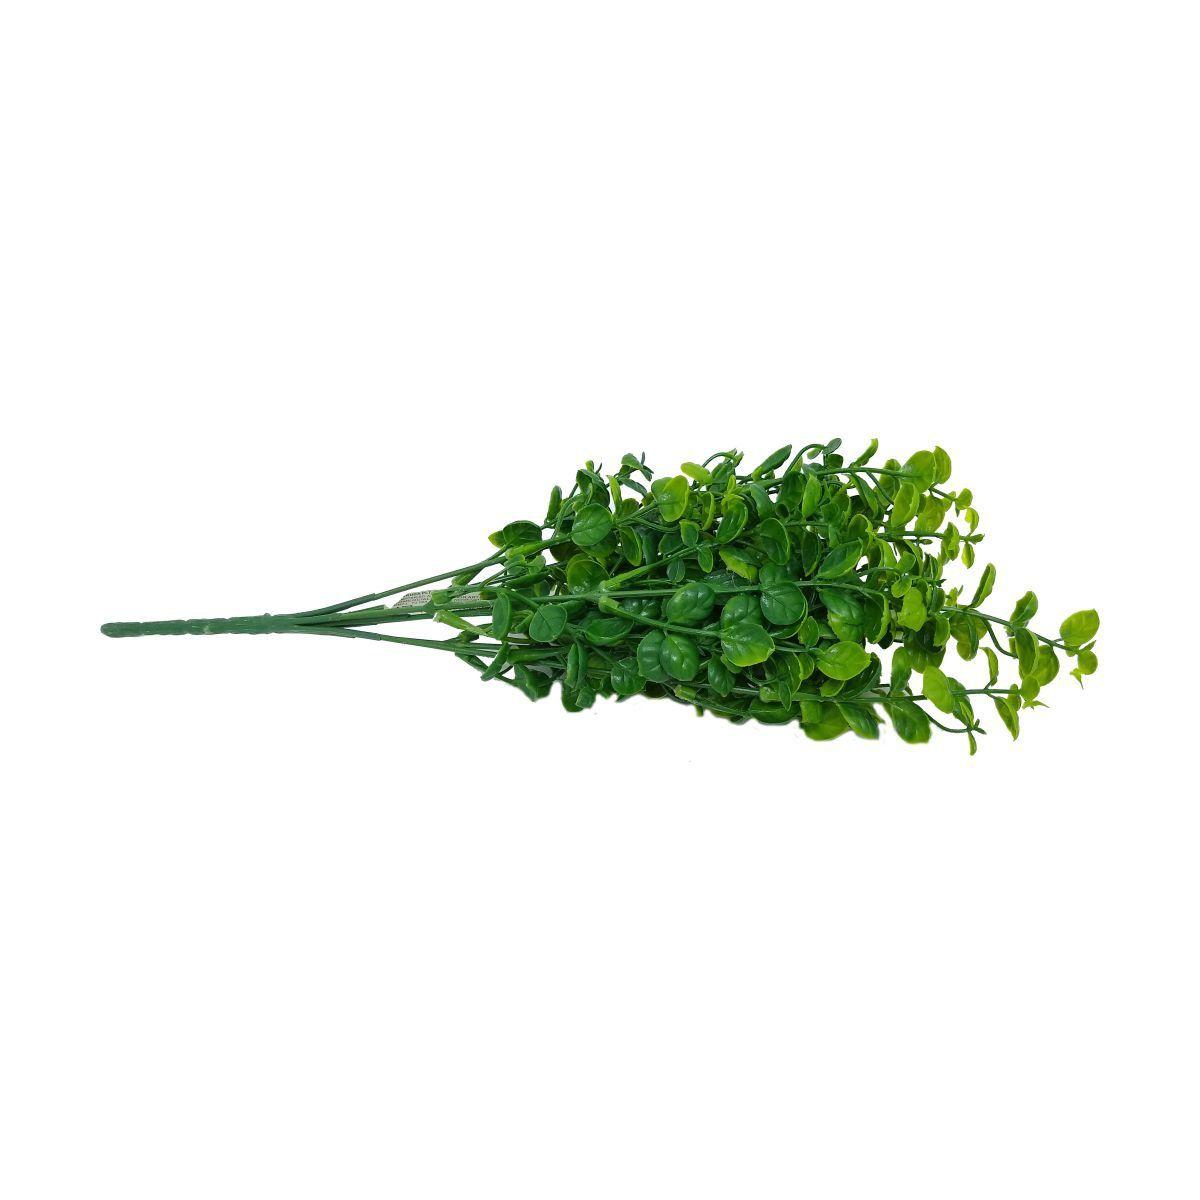 Folhagem Arruda PLT X7 Verde 36cm - 27185001